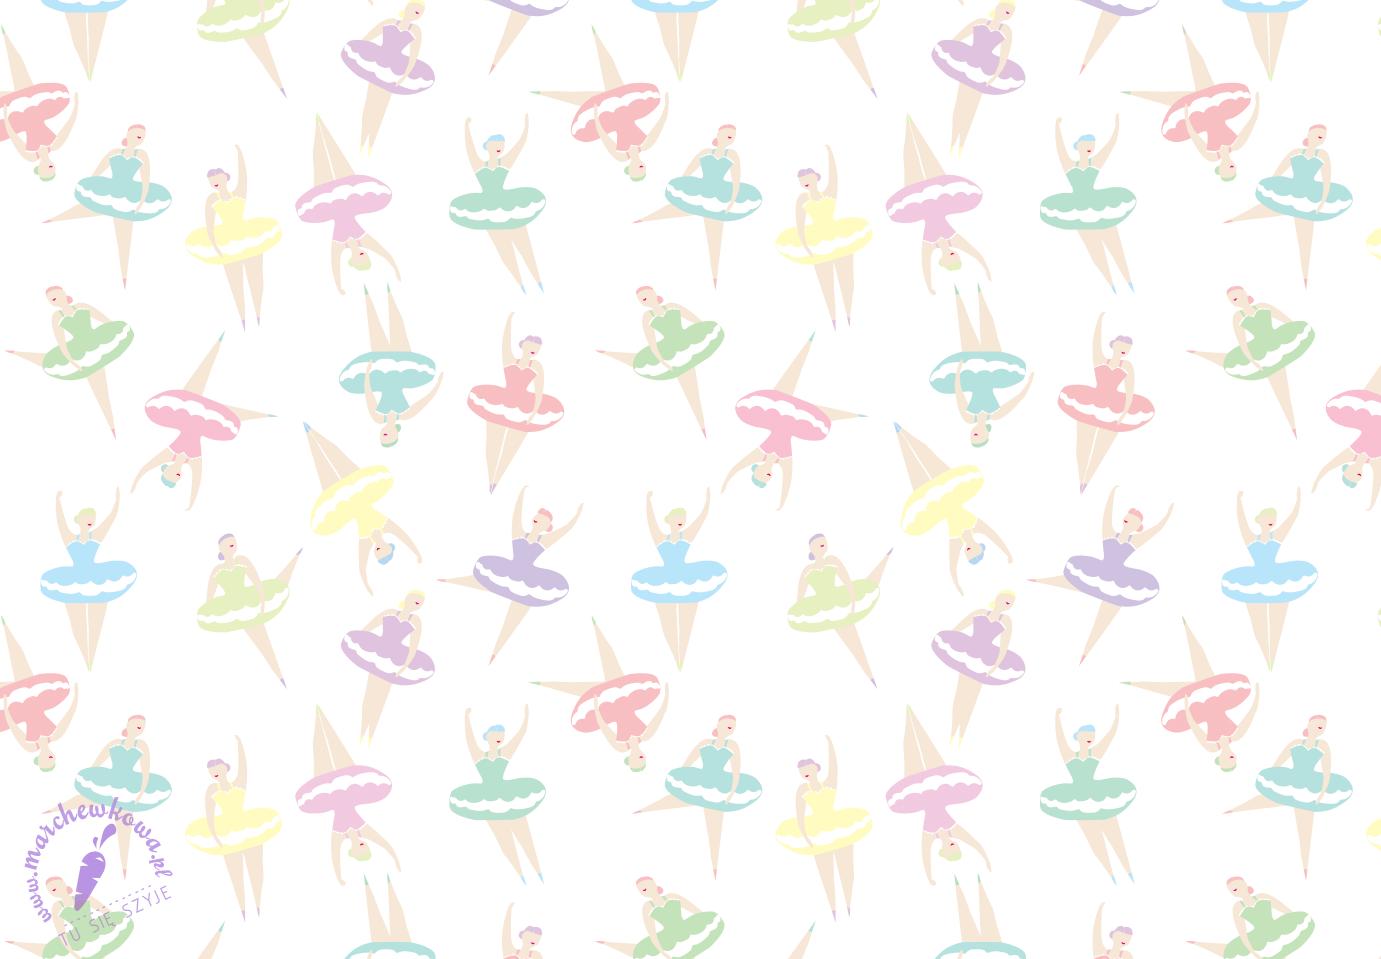 marchewkowa, grafika, nadruk, projekt tkaniny, wzór, print, baletnice, Ballerinas